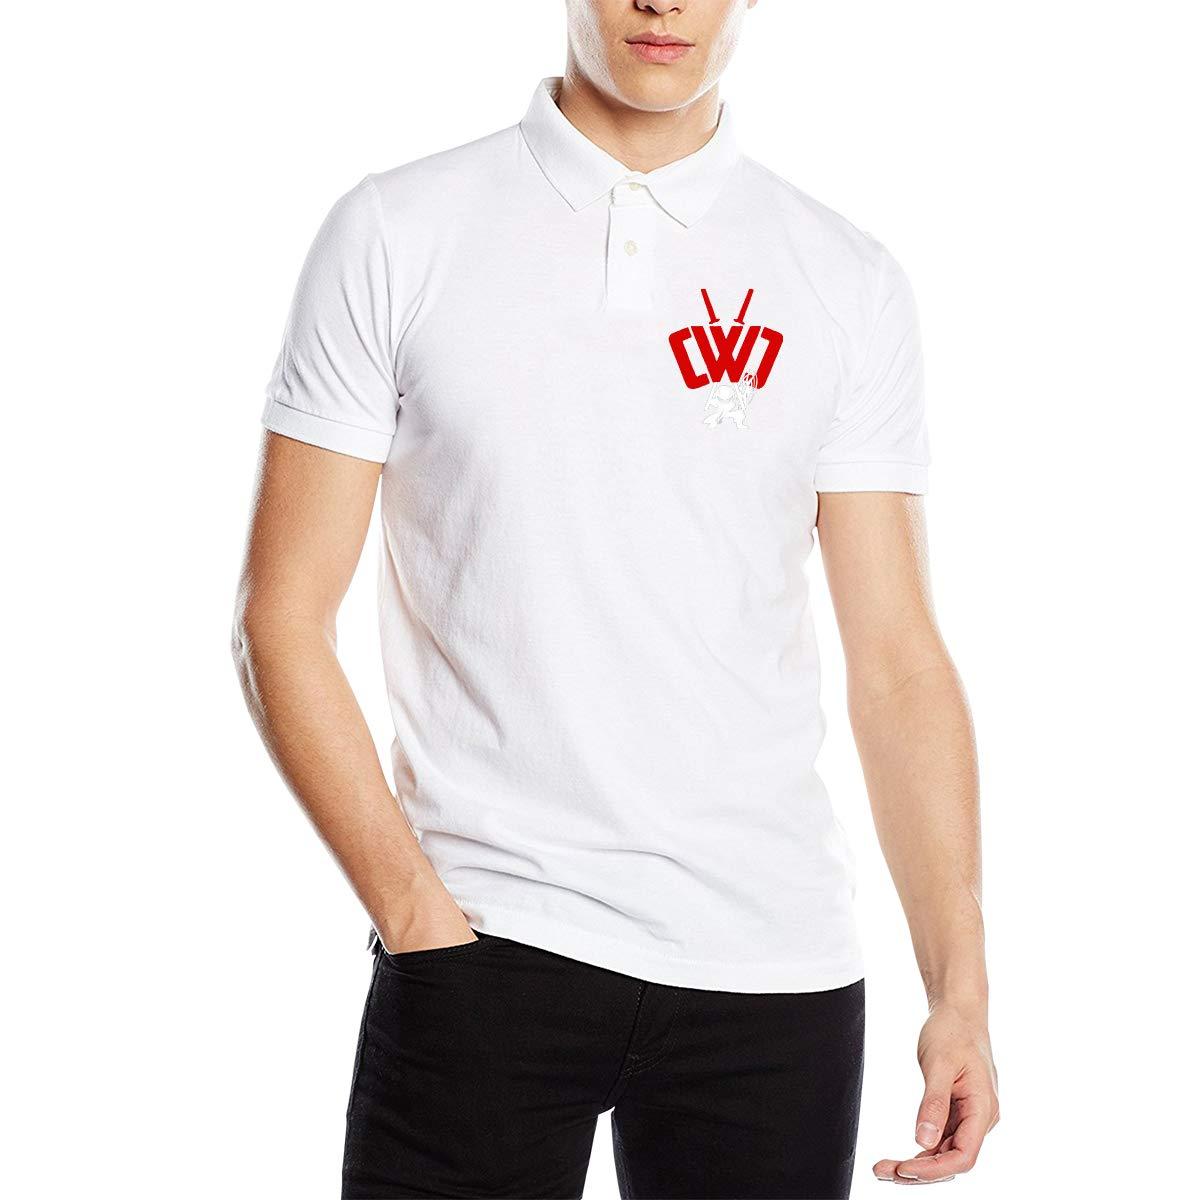 Arilce CWC Chad Wild Clay Ninja Men Polo Shirt Short Sleeve Lapel Blouse Black